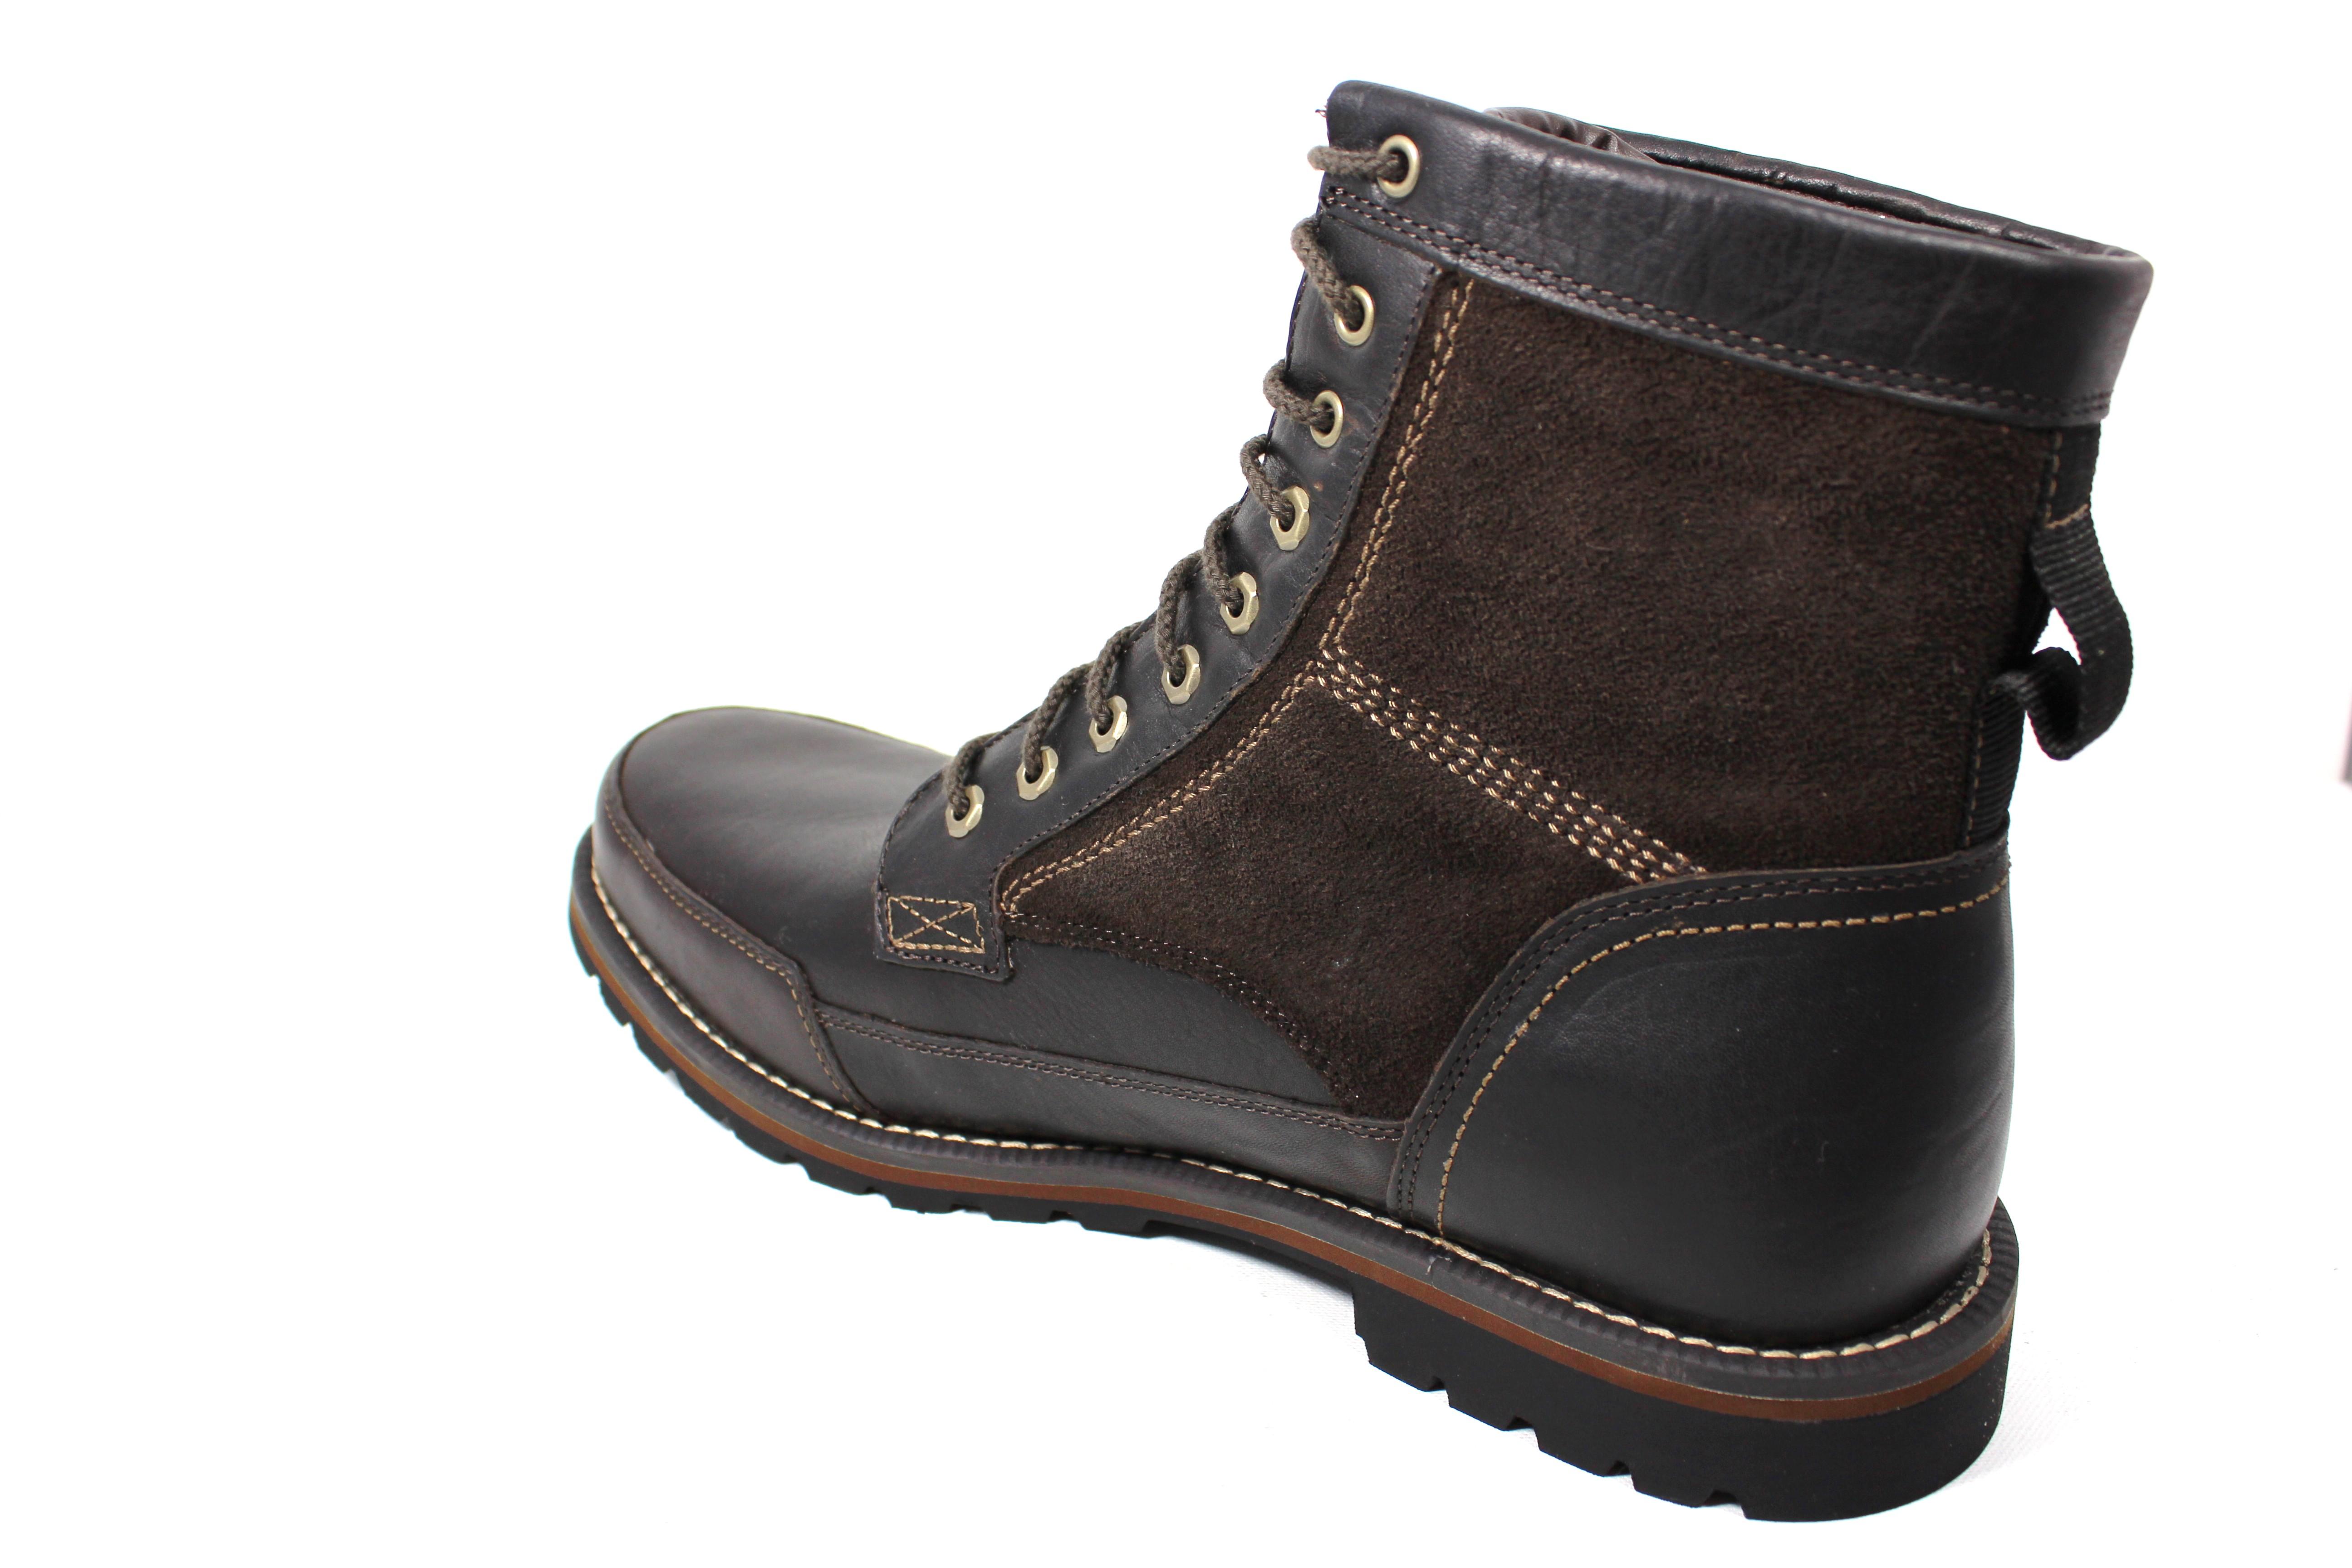 toscanini schuhe in ber und untergr en trend boots 17124004 t 9708. Black Bedroom Furniture Sets. Home Design Ideas